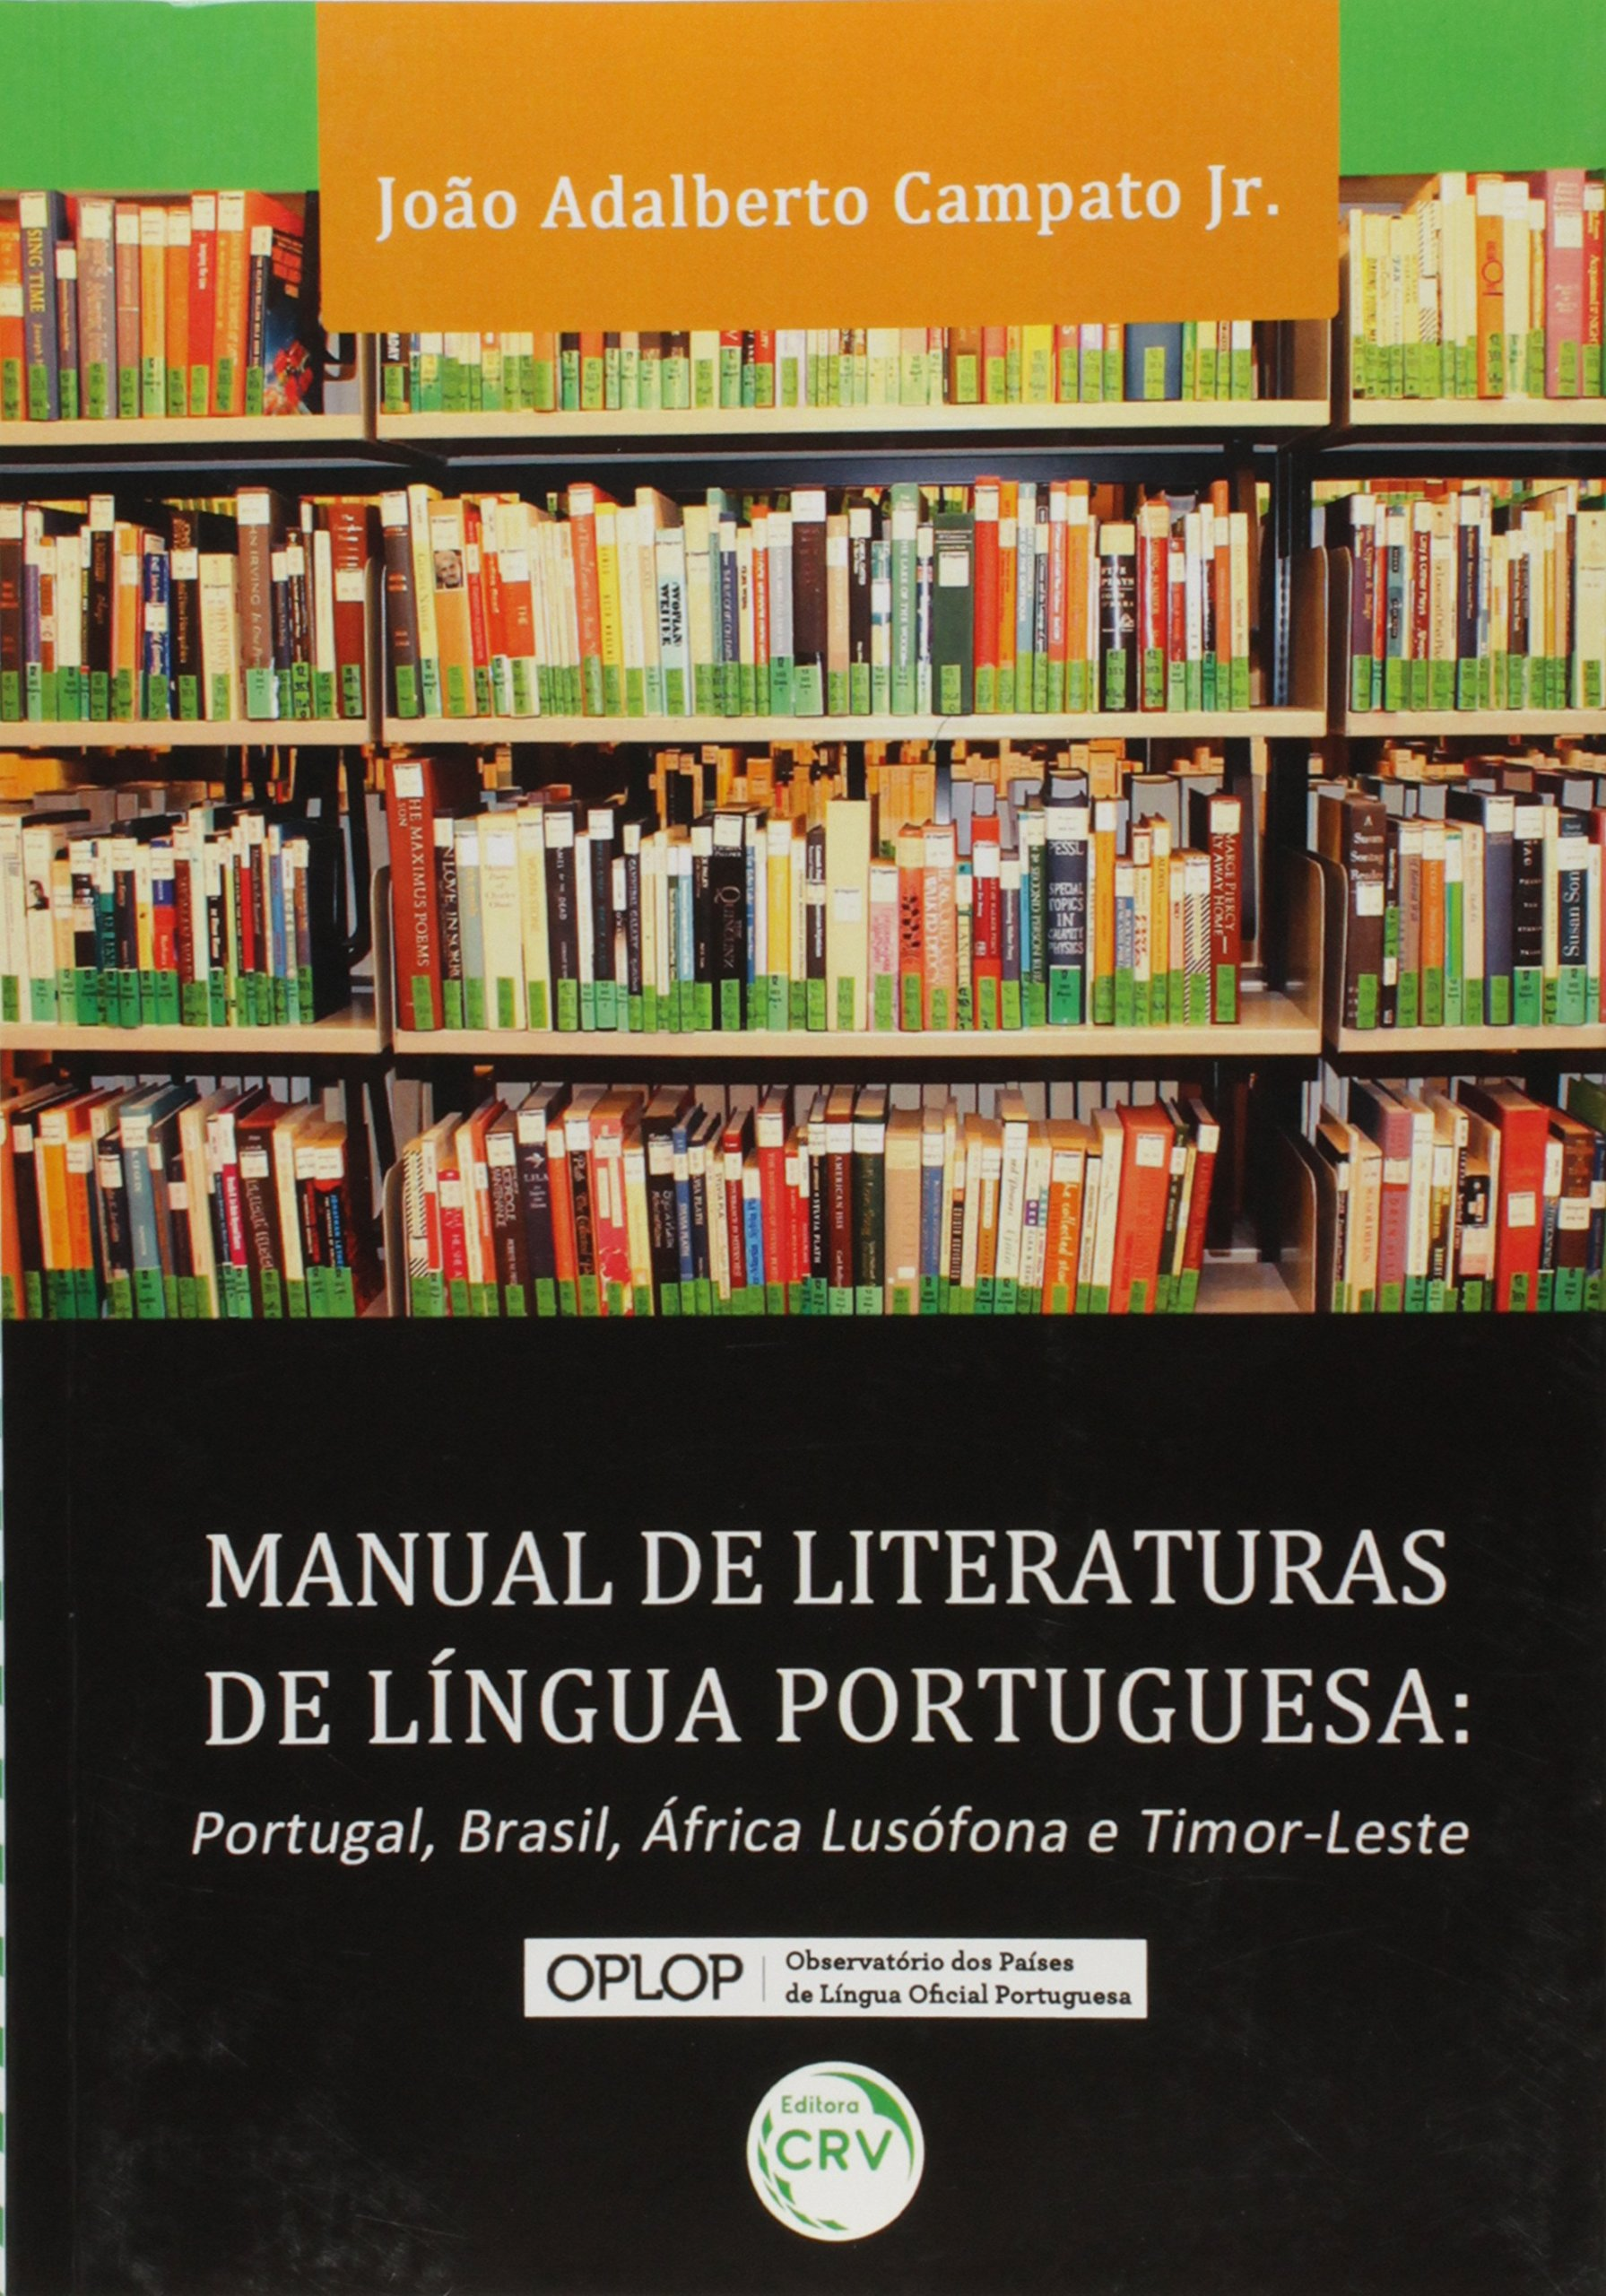 Manual de Literaturas de Língua Portuguesa. Portugal, Brasil, África Lusófona e Timor-Leste pdf